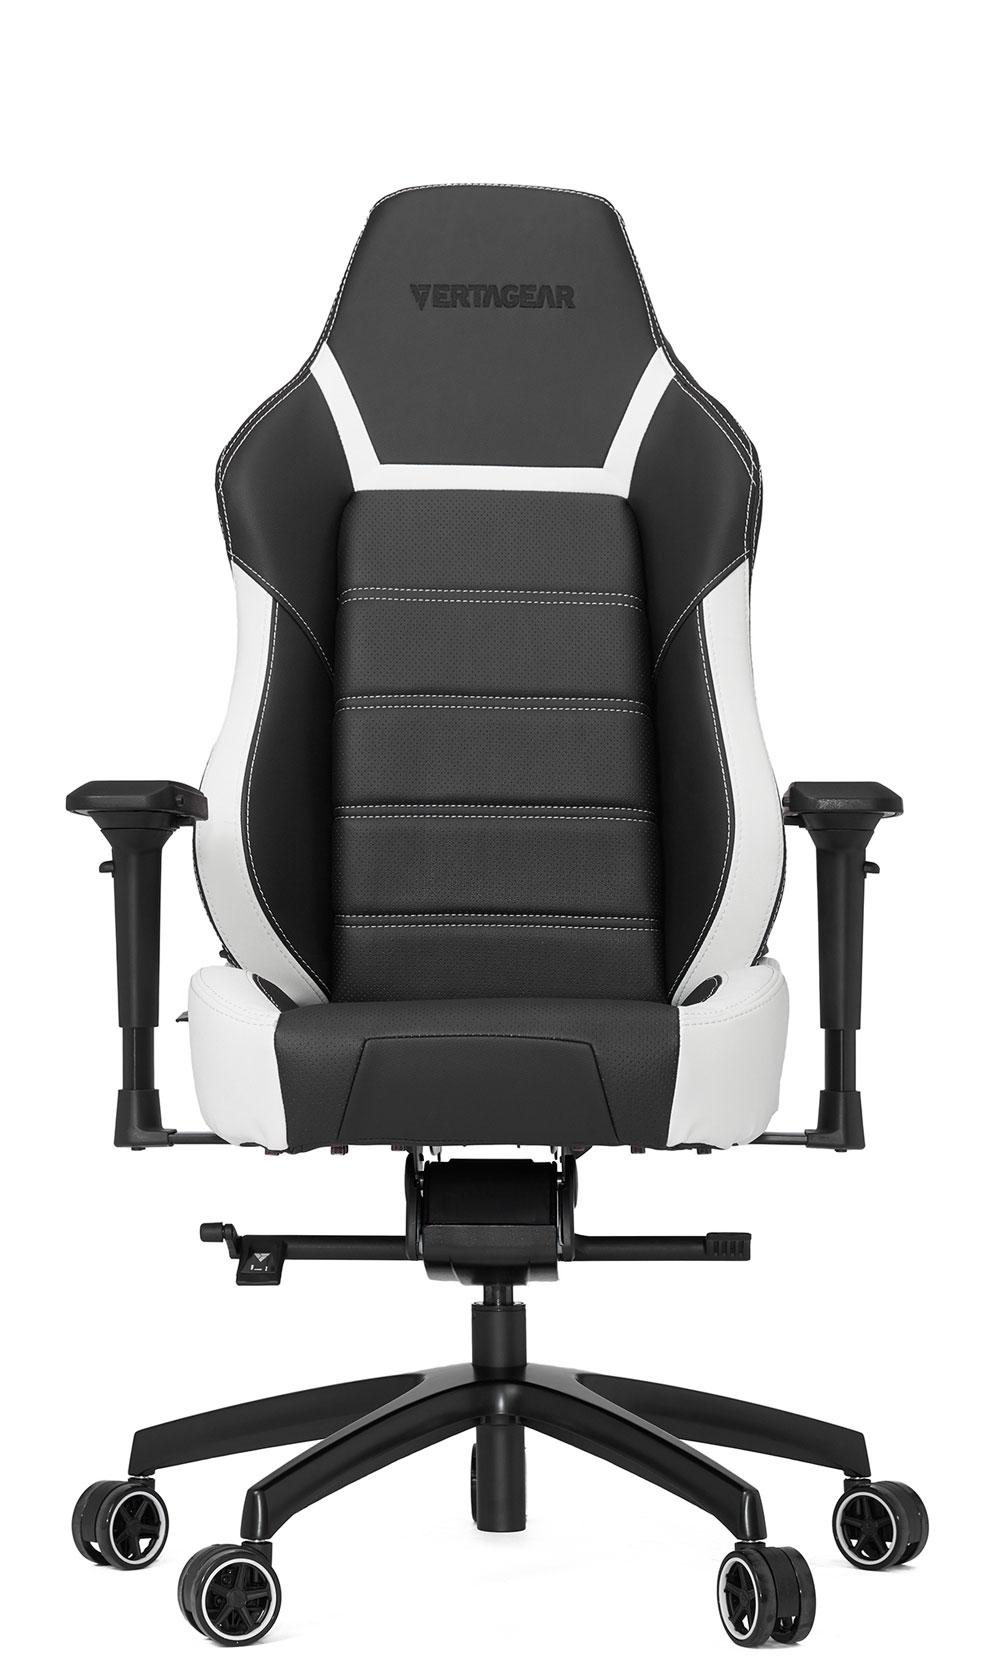 Vertagear PL6000 Gaming Chair Black / White